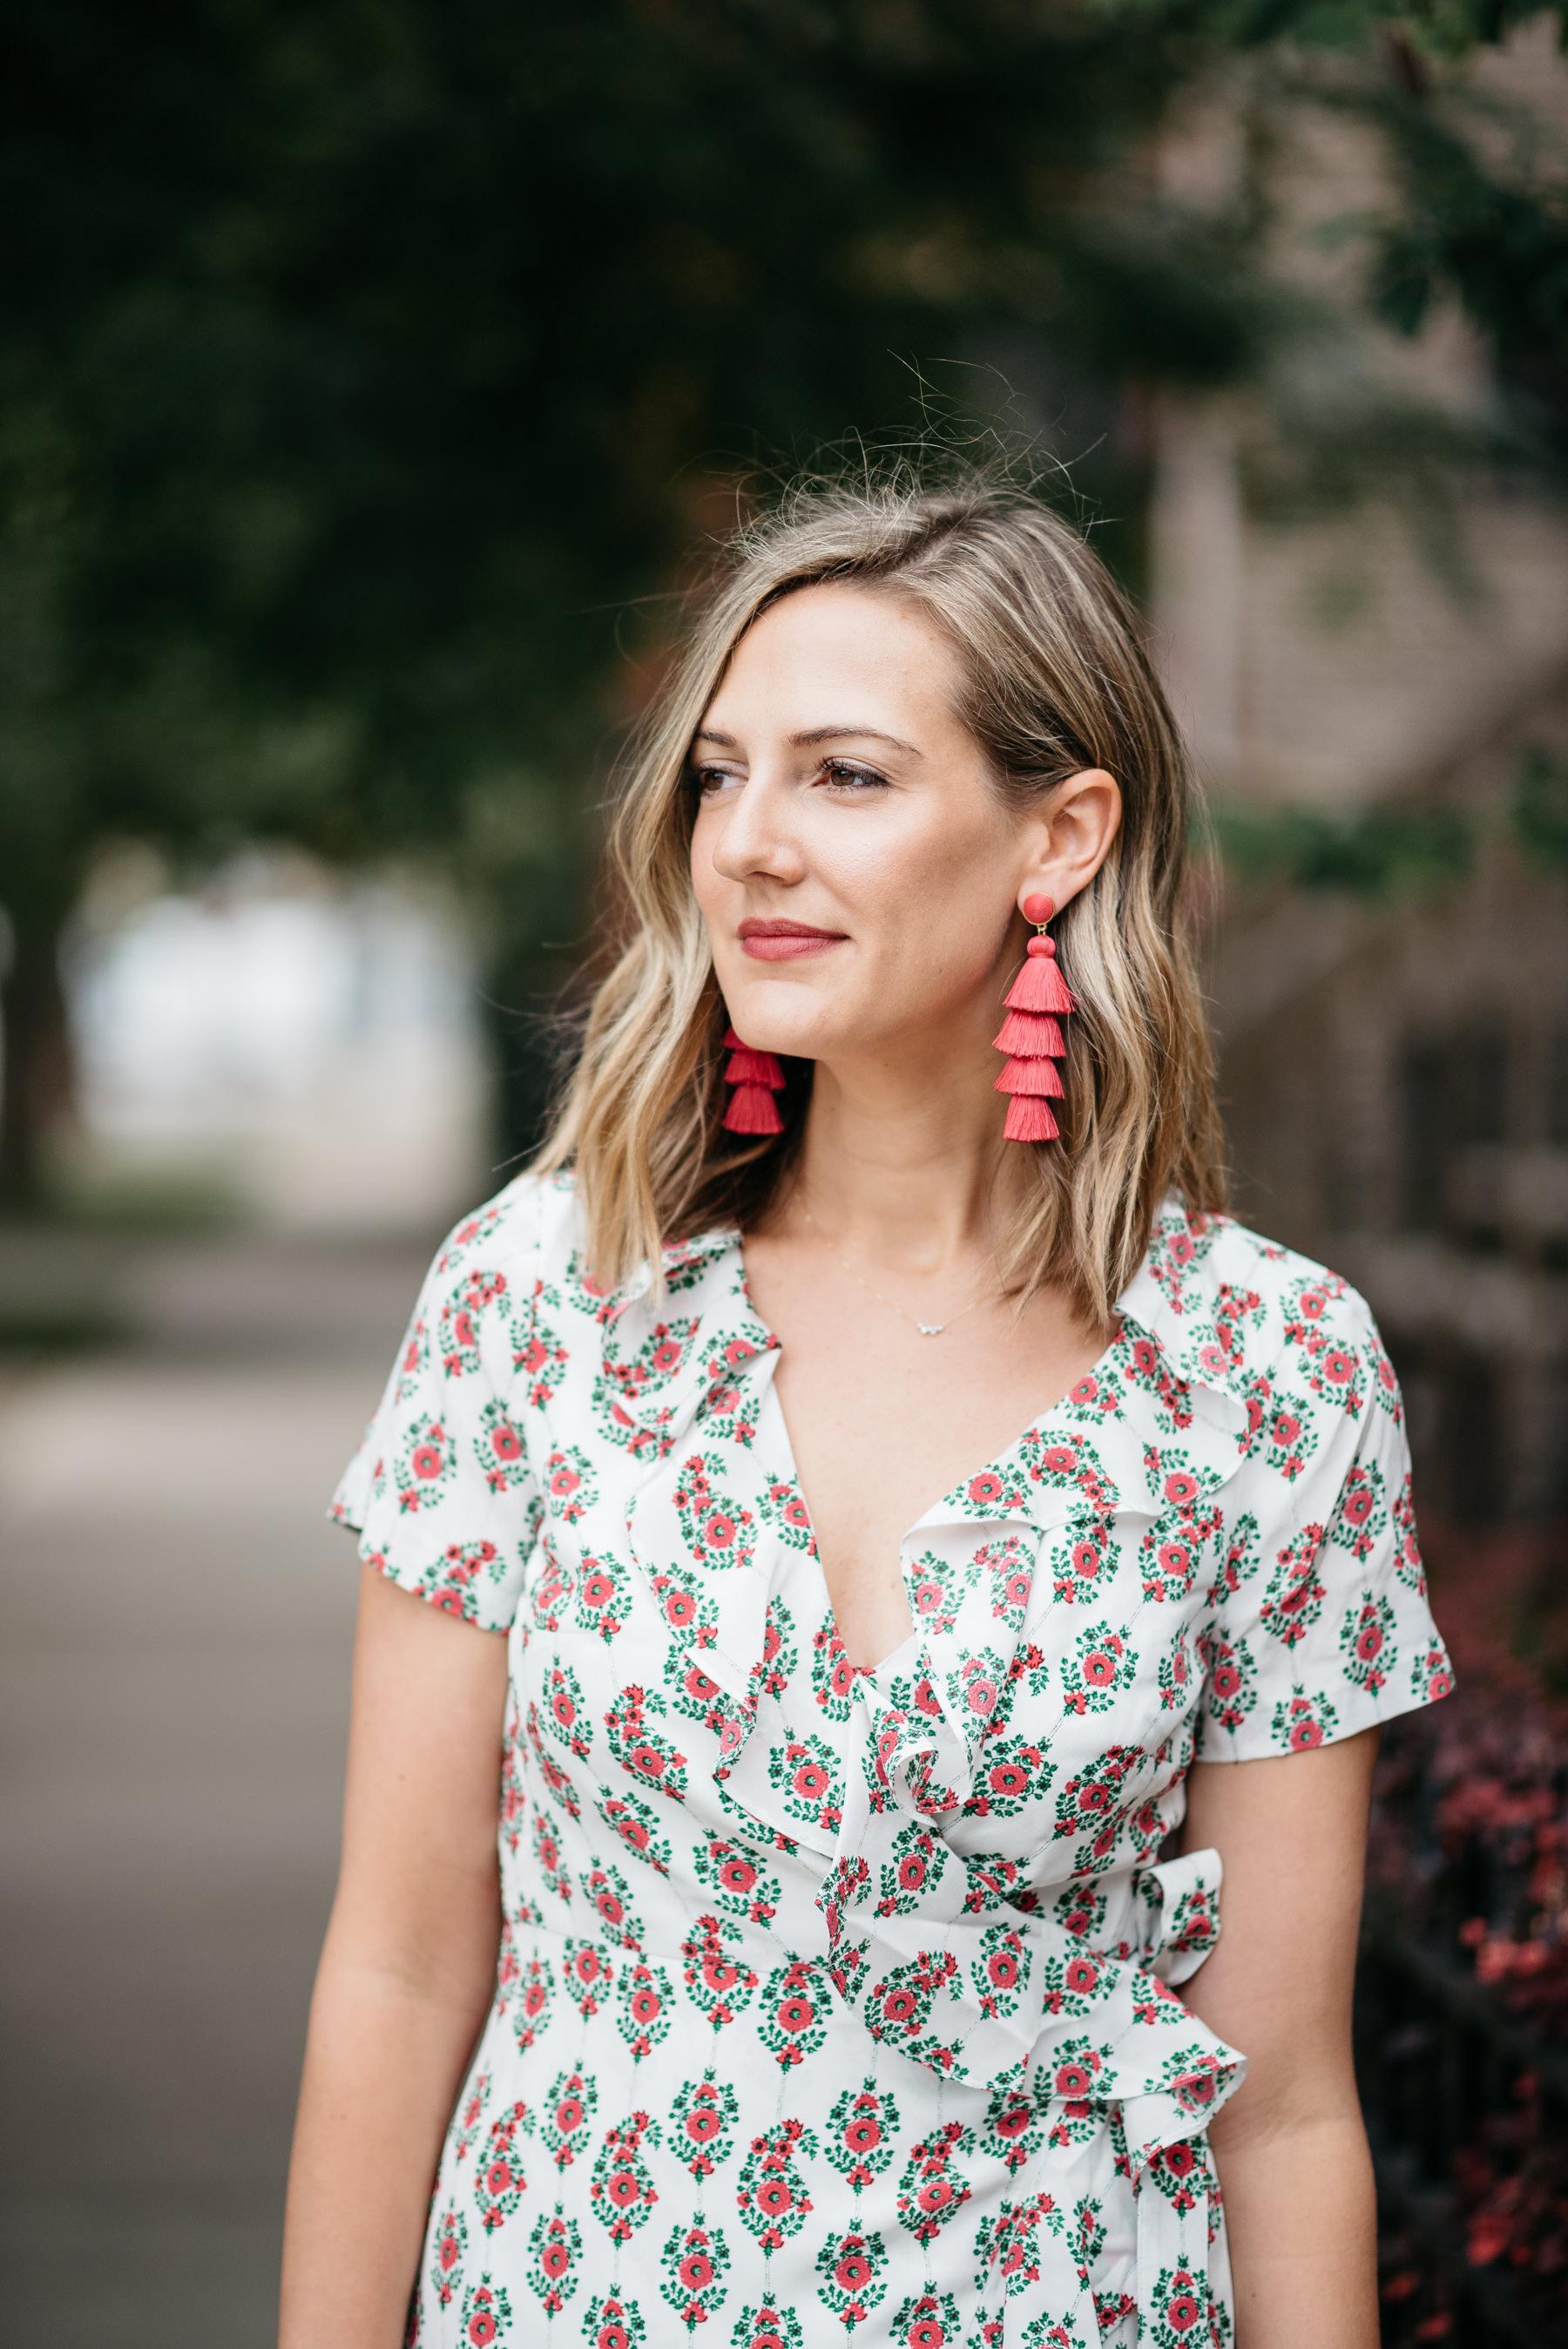 floral fall dress statement earrings wavy lob